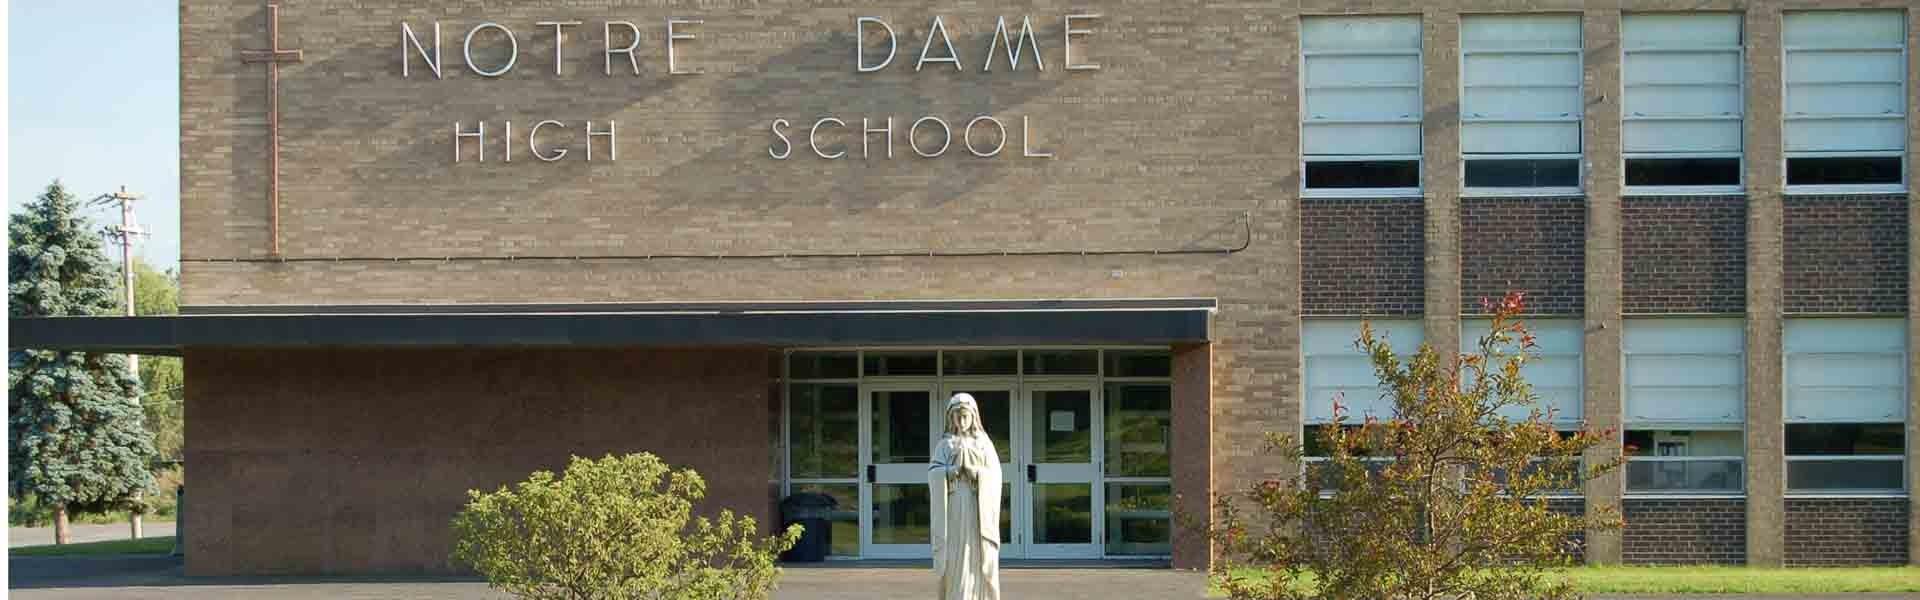 NotreDame-NewYork-USA-School-Banner-2019